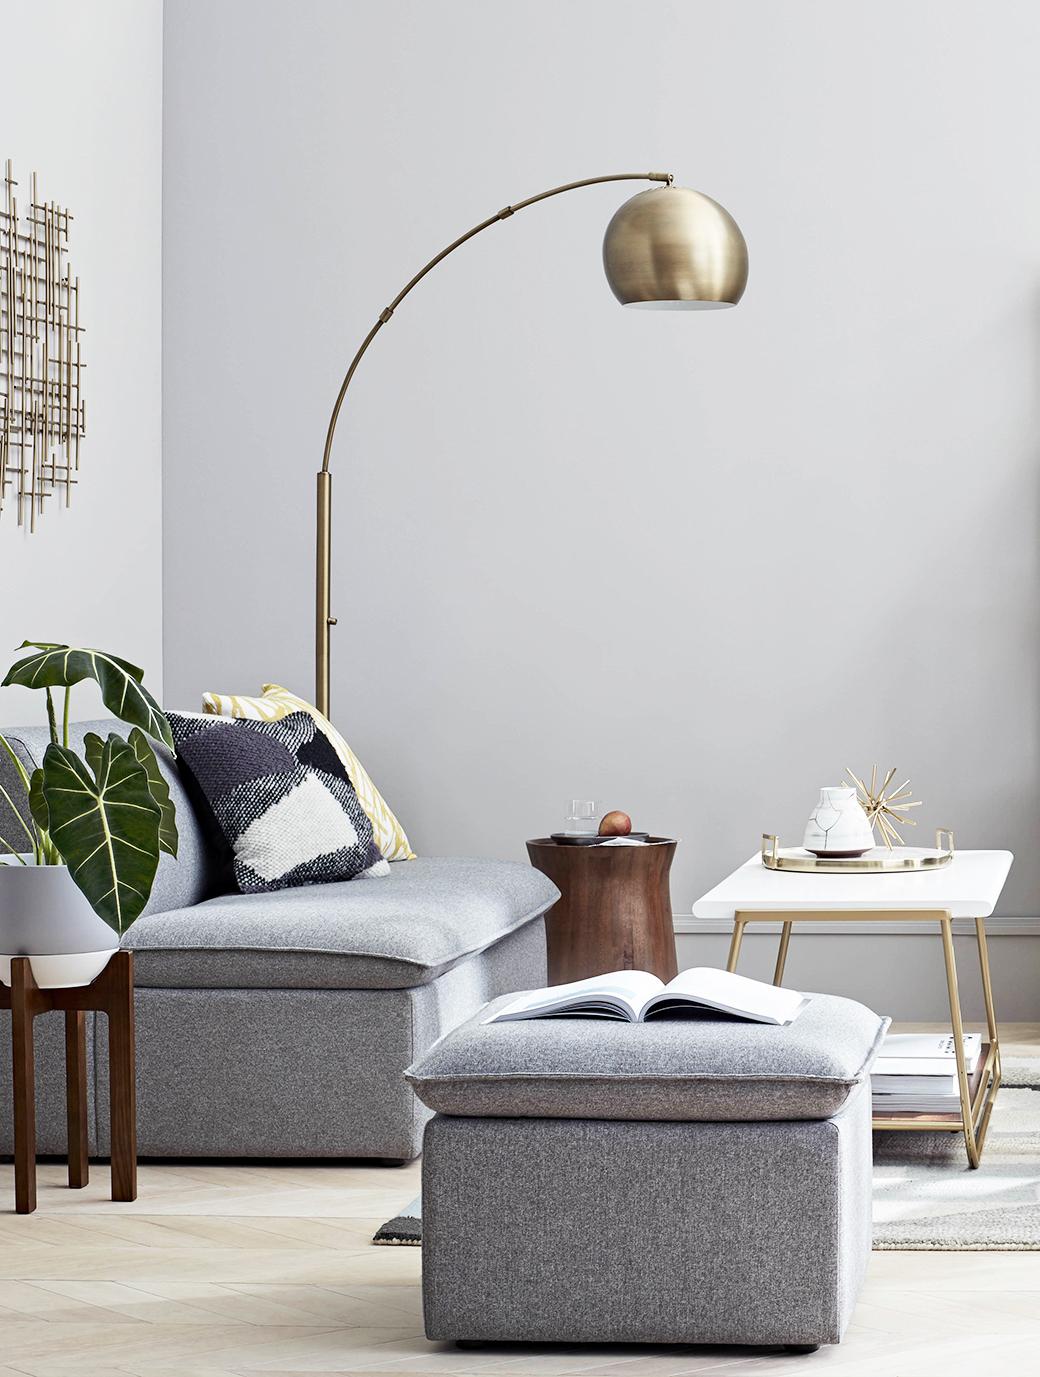 Grey modular sofa and ottoman, Arc Globe floor lamp, Sayer coffee table.